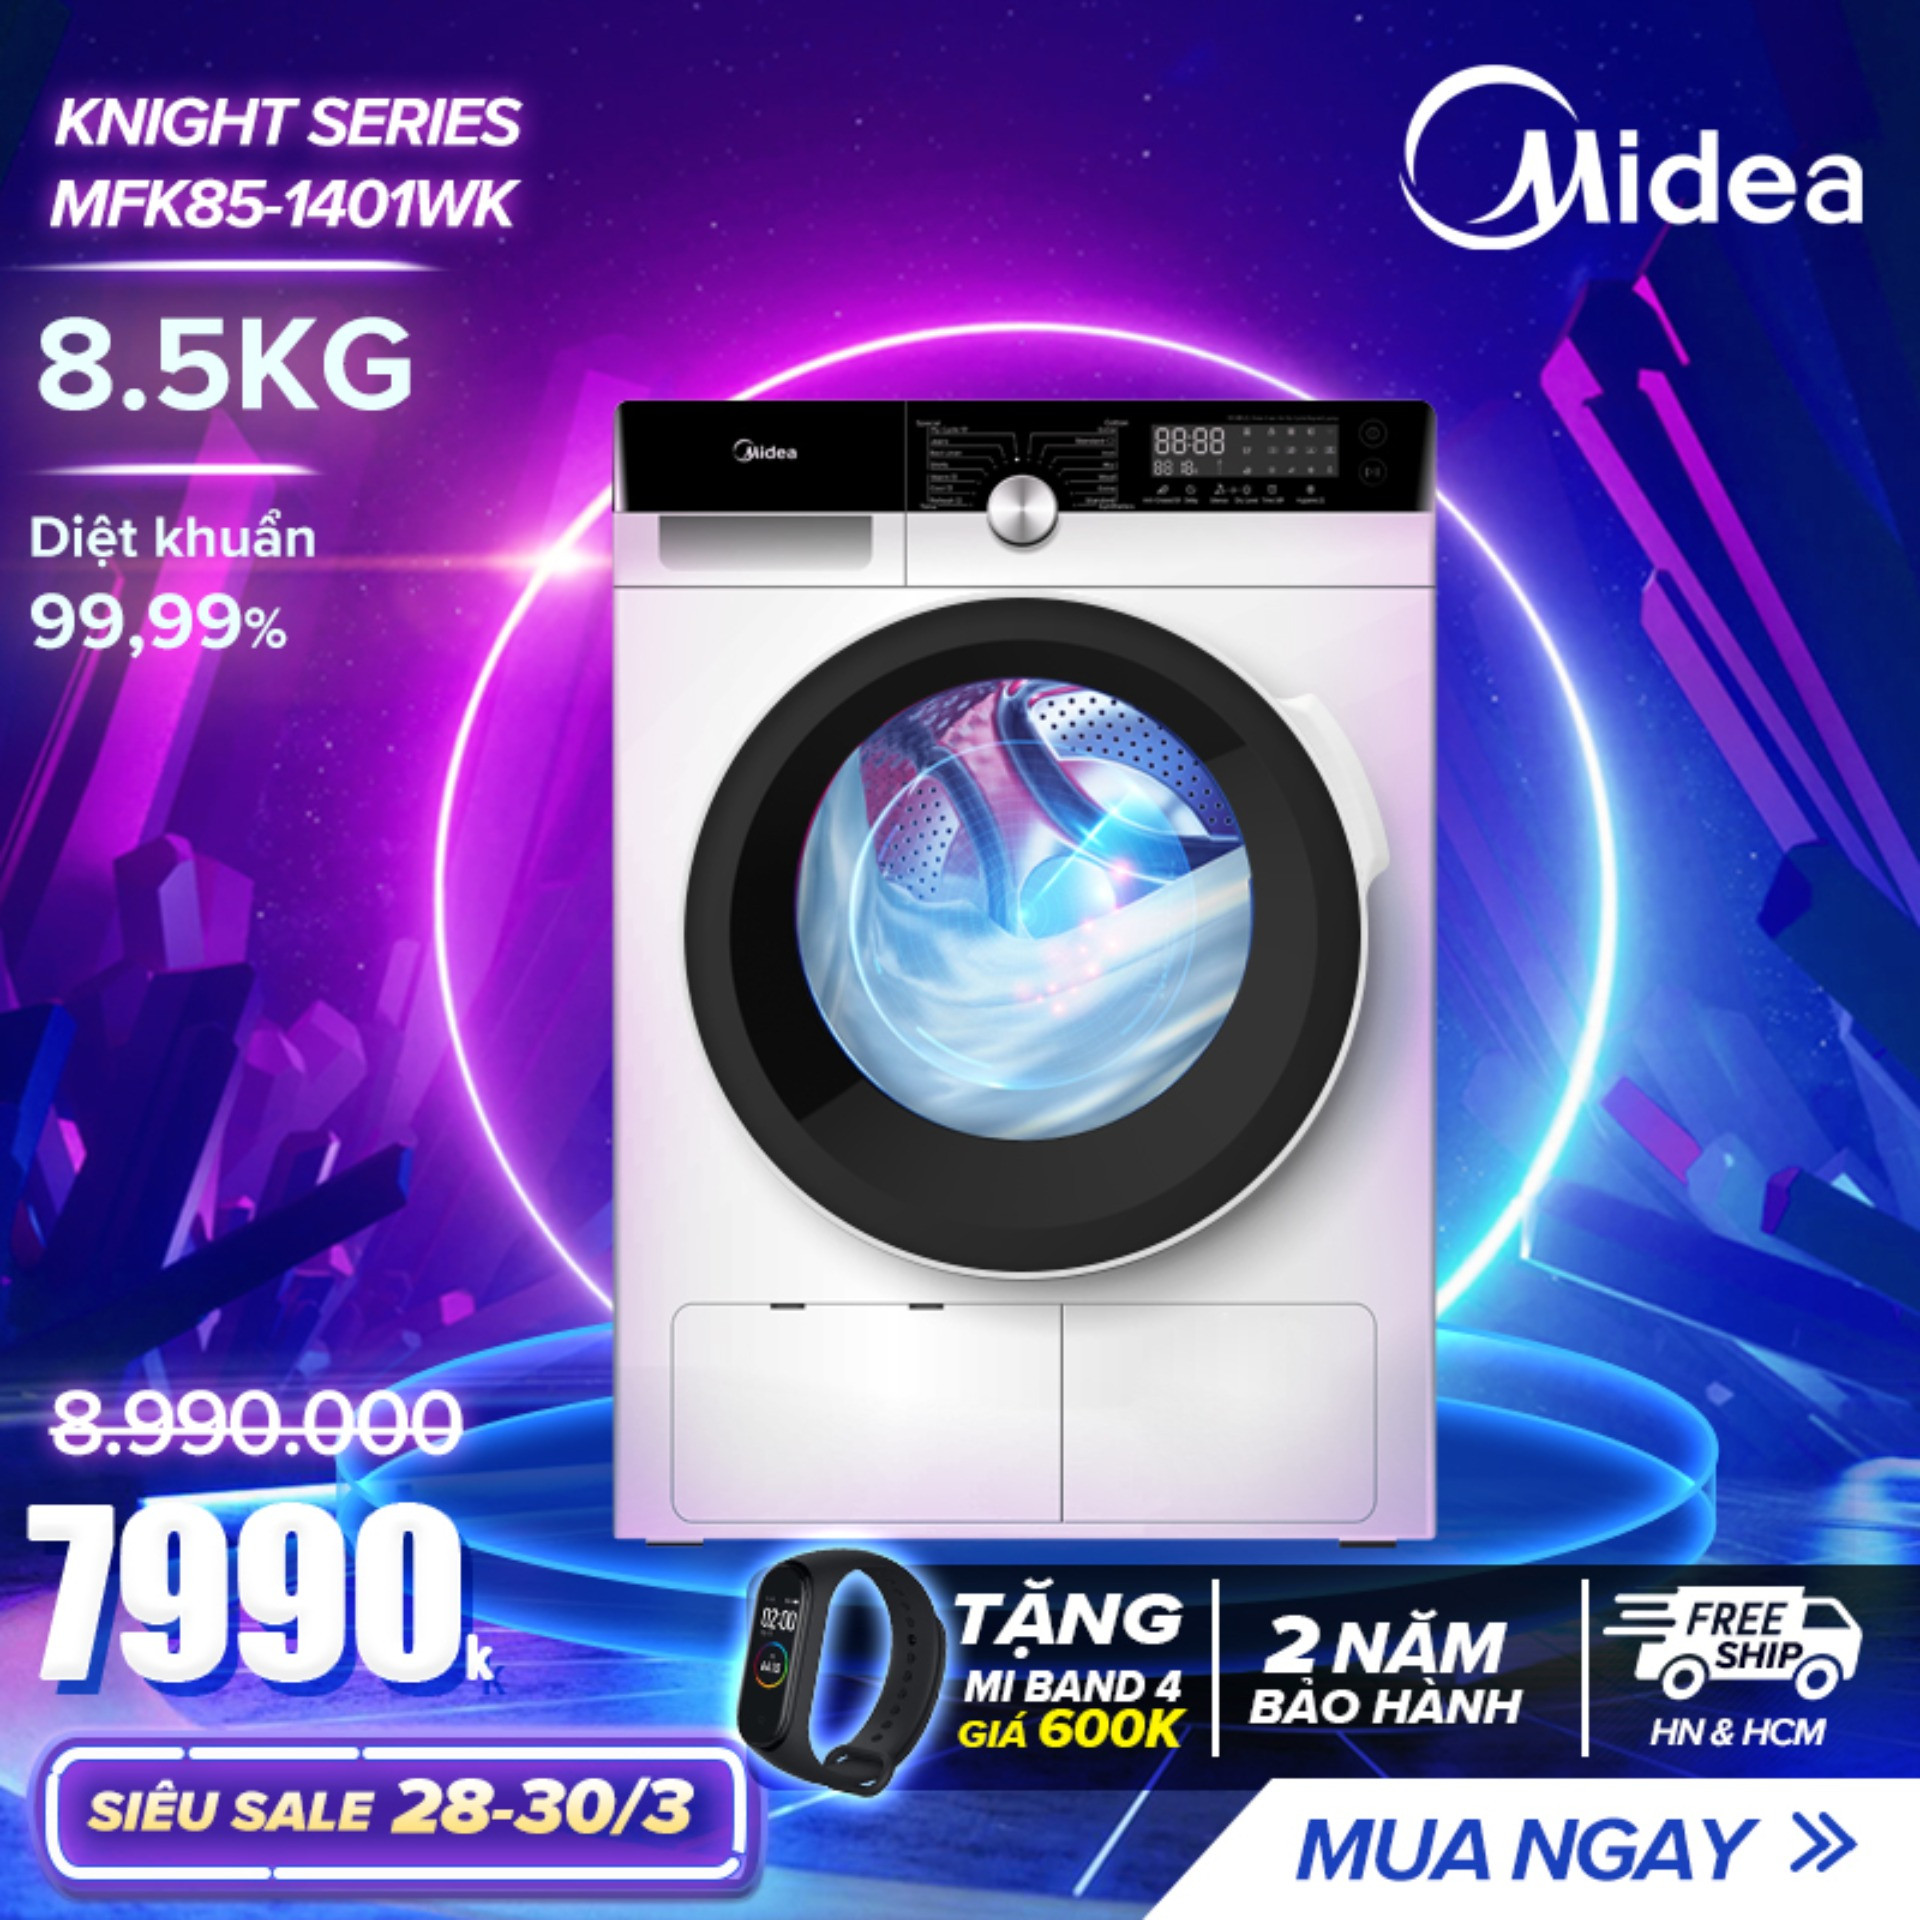 Shop bán Máy Giặt Cửa Trước 8.5kg Midea MFK85-1401 (Diệt Khuẩn, 14 ...